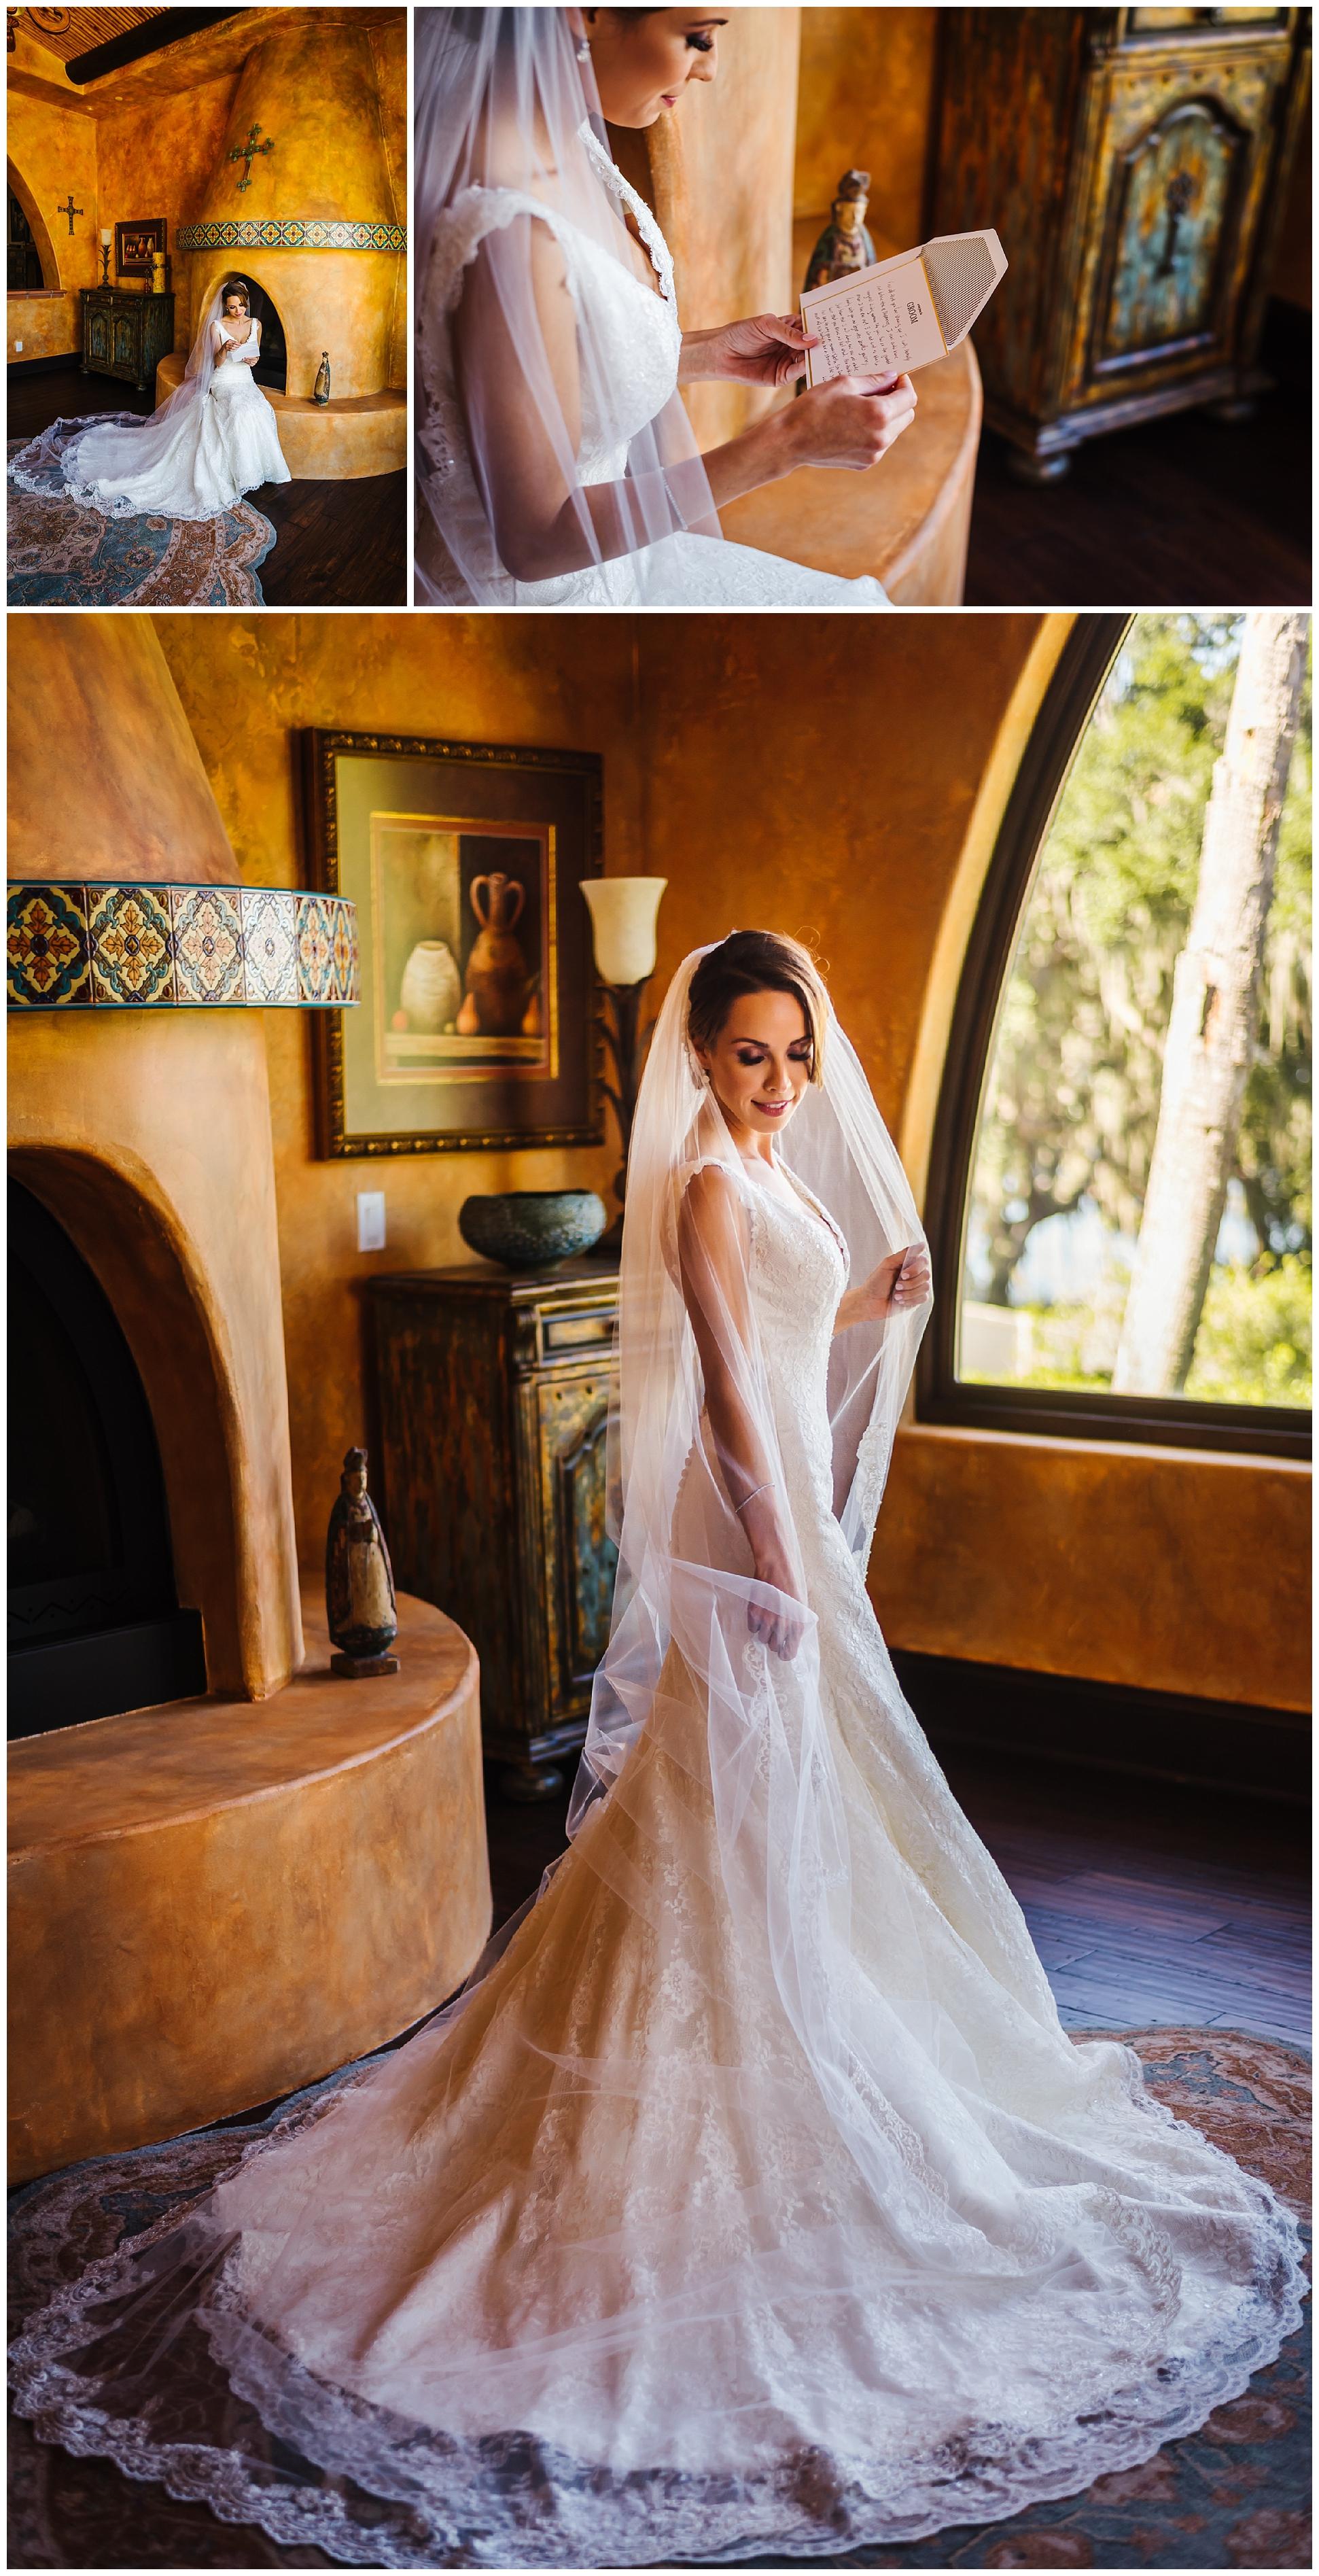 Tampa-luxury-wedding-photographer-mision-lago-private-estate_0013.jpg